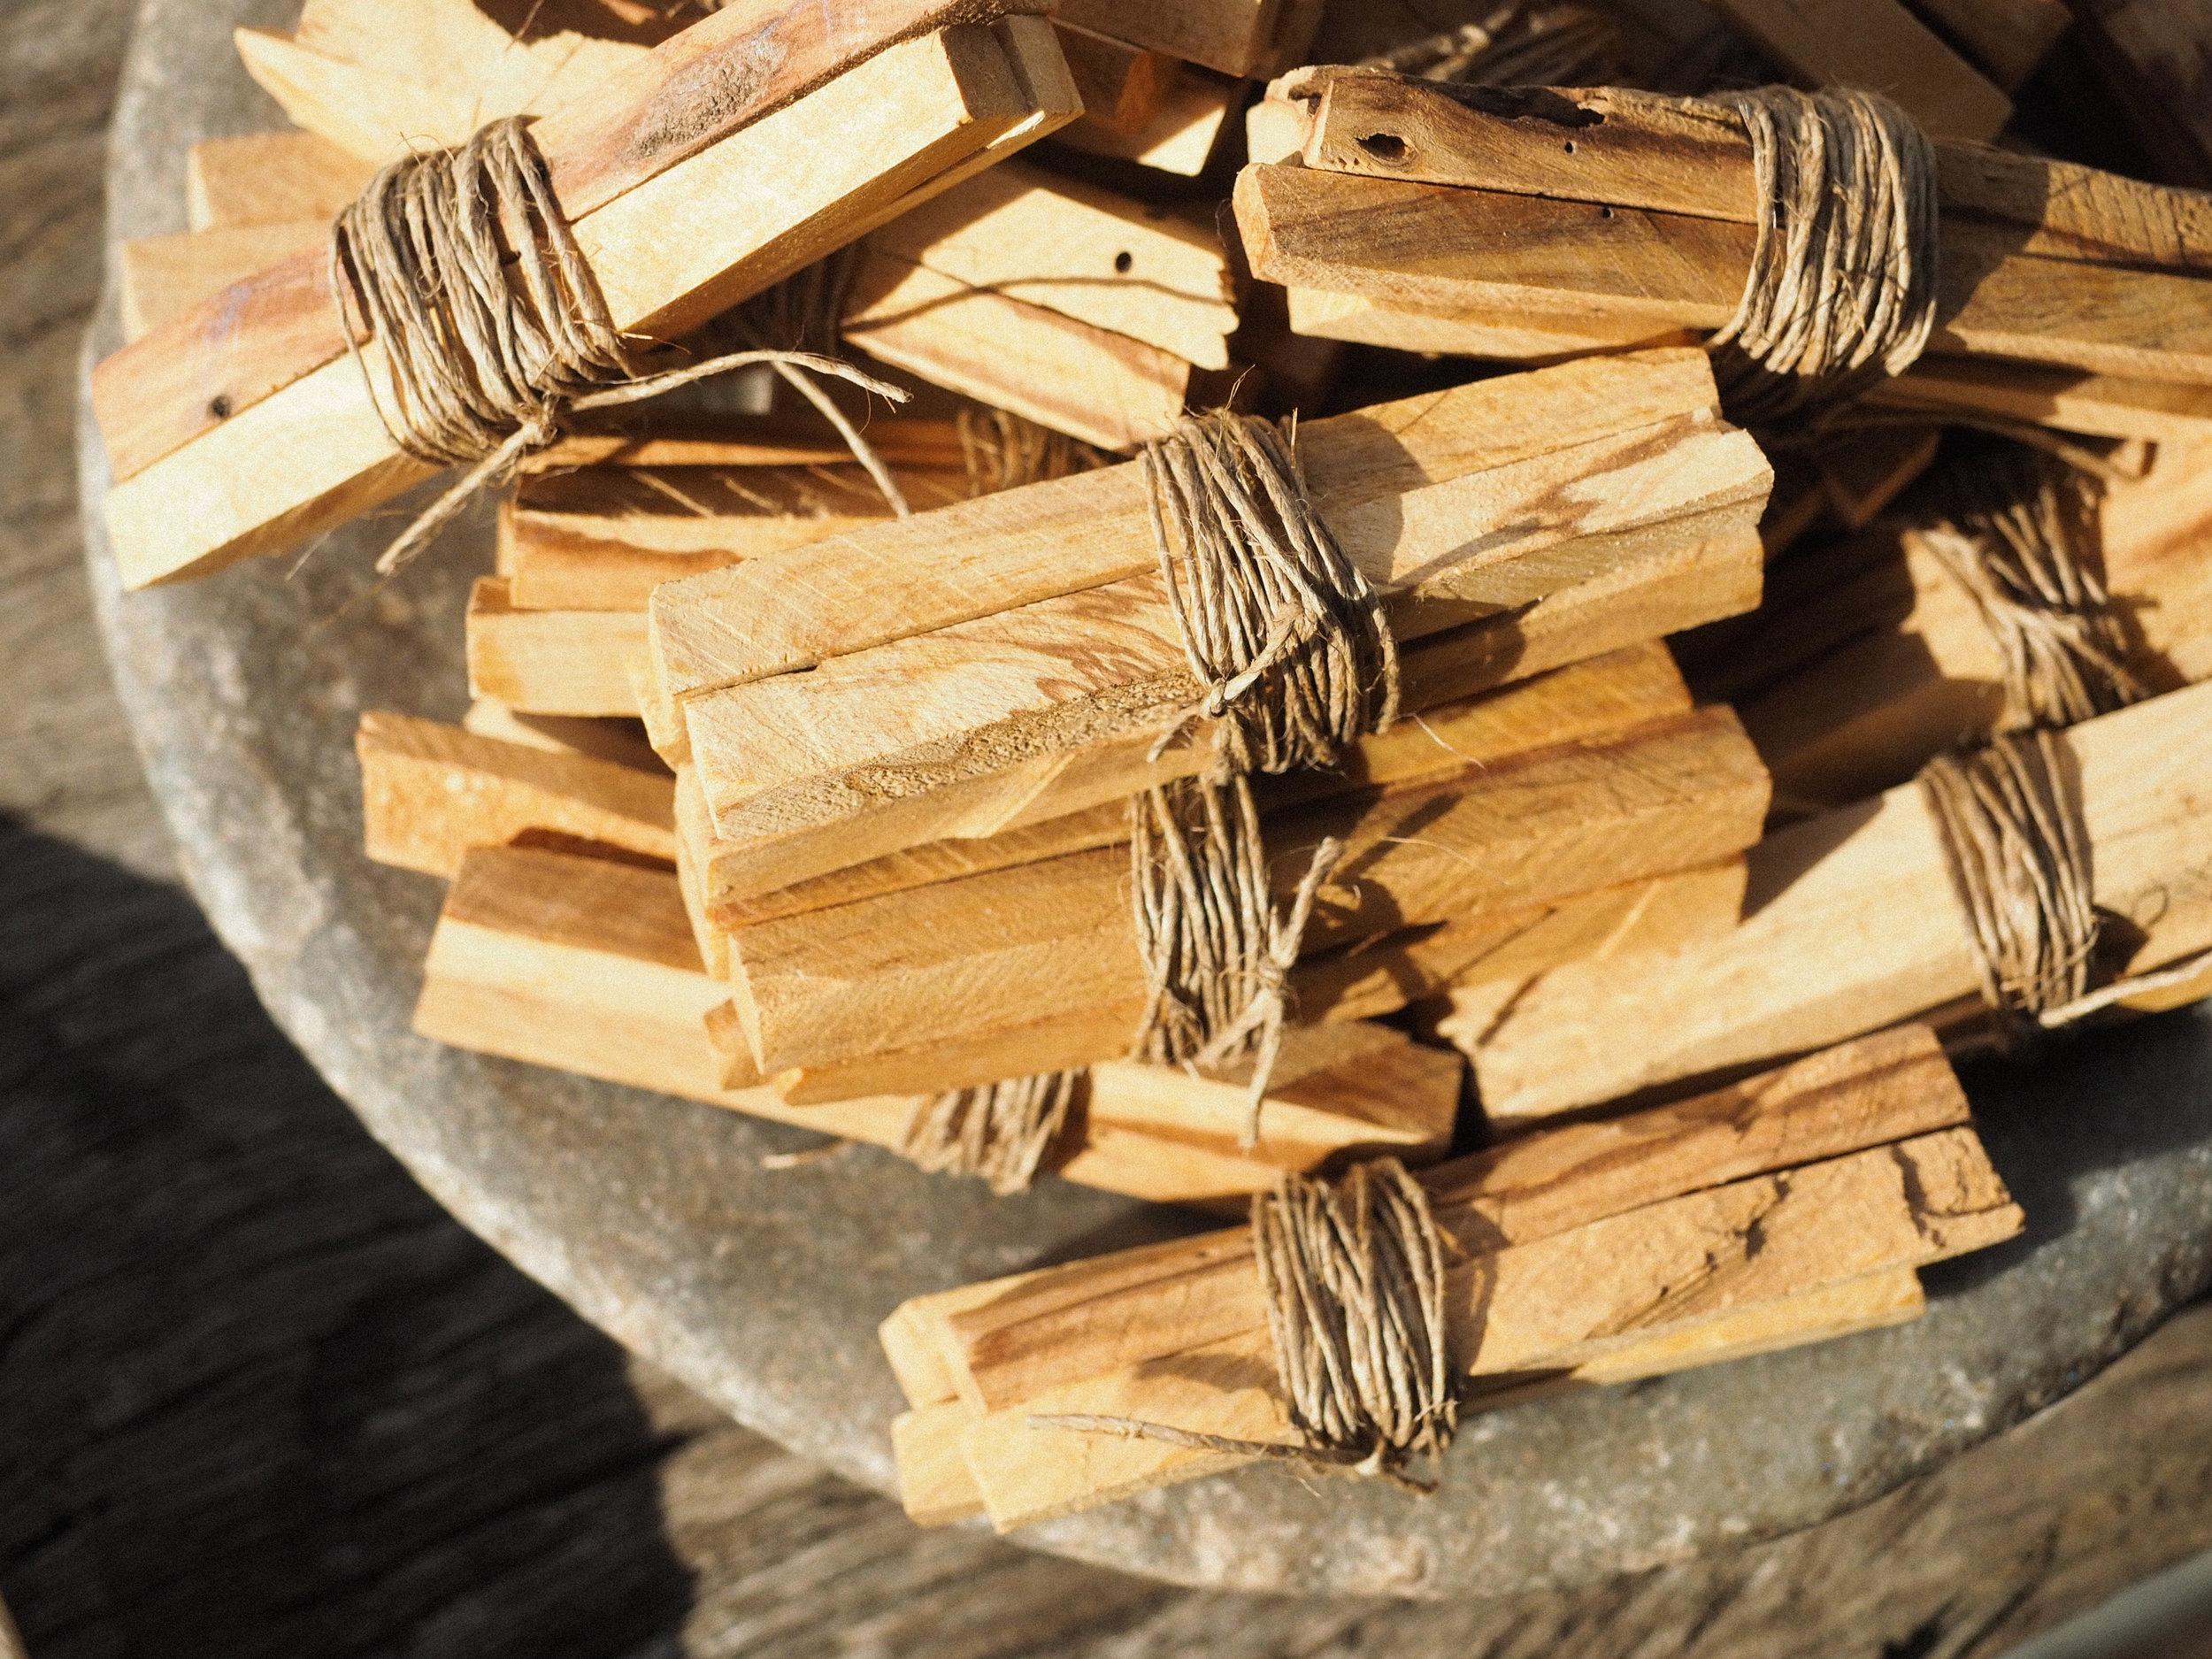 Ethically Sourced Palo Santo Sticks